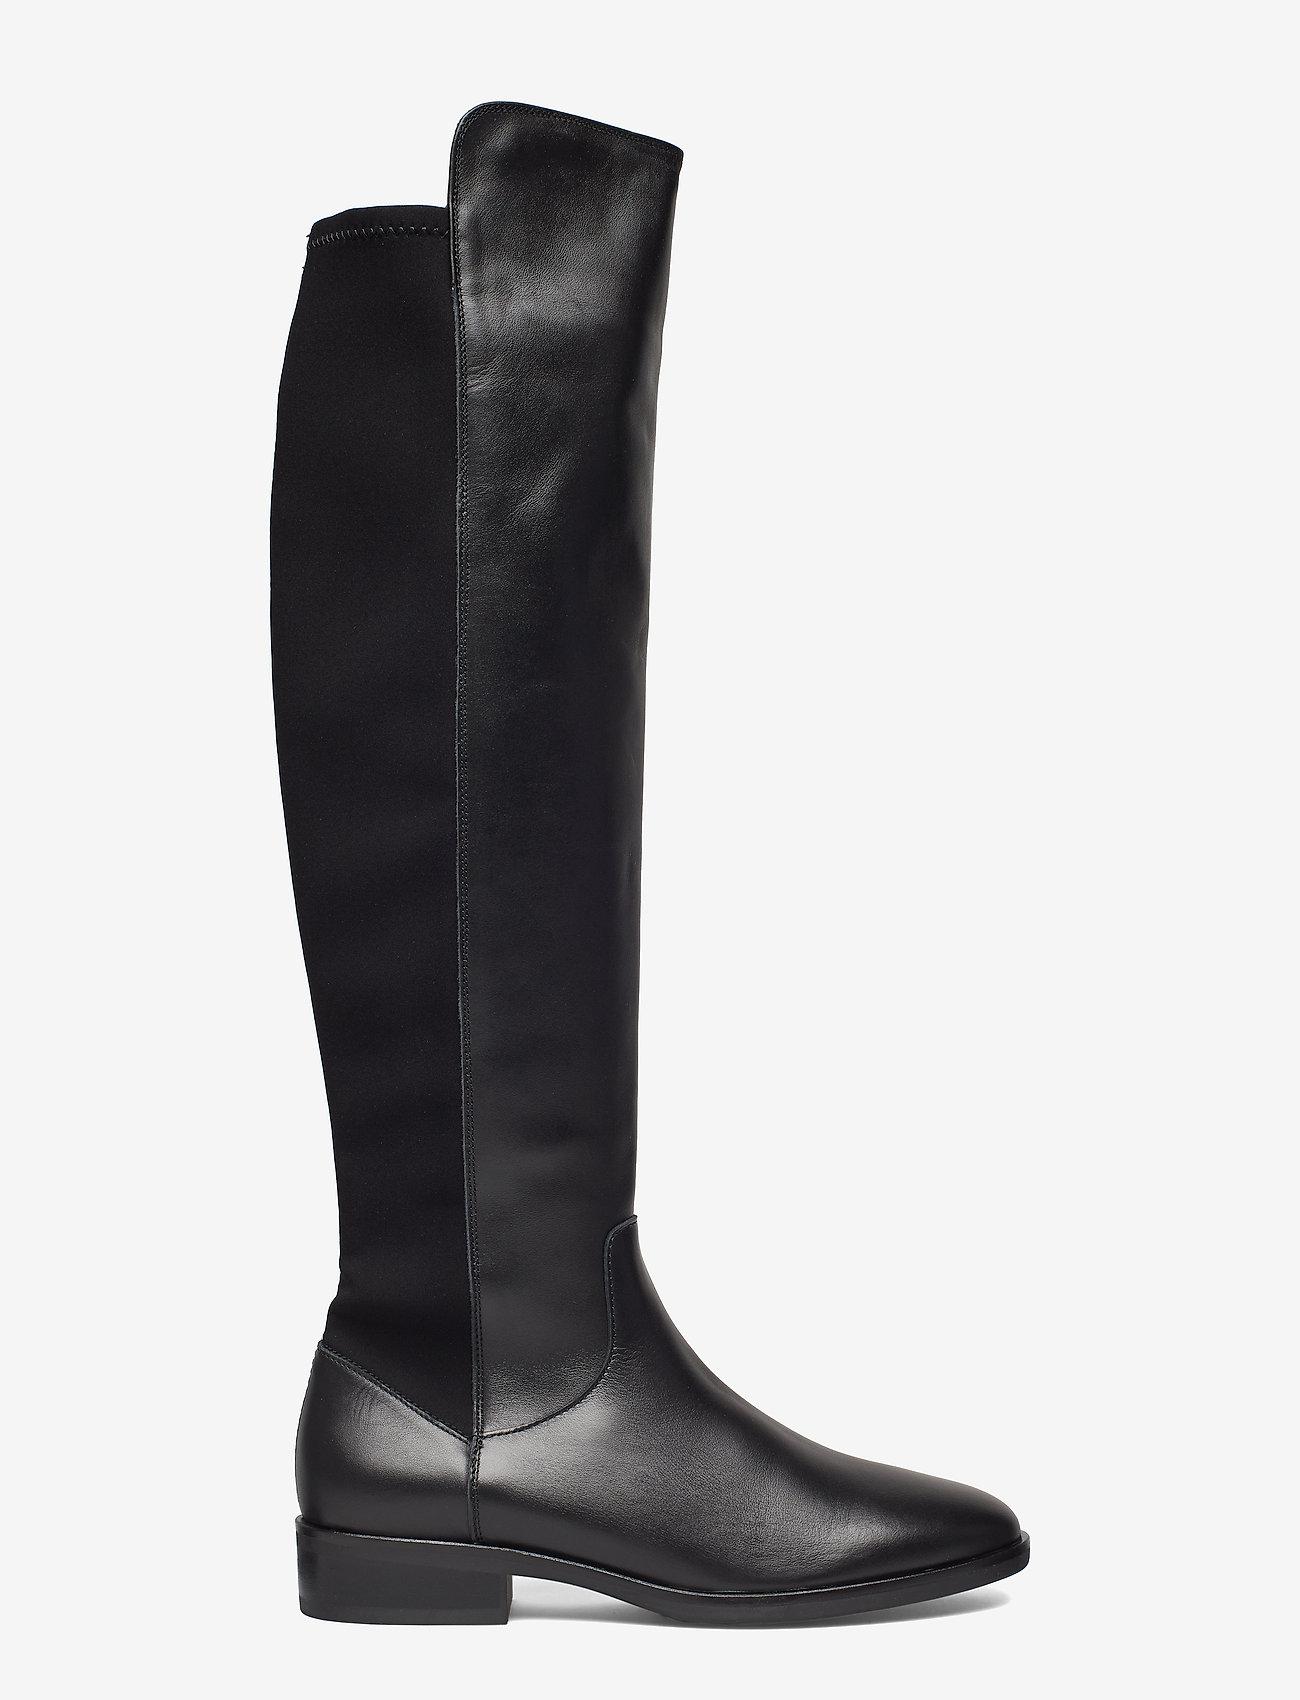 Clarks - Pure Caddy - höga stövlar - black leather - 1